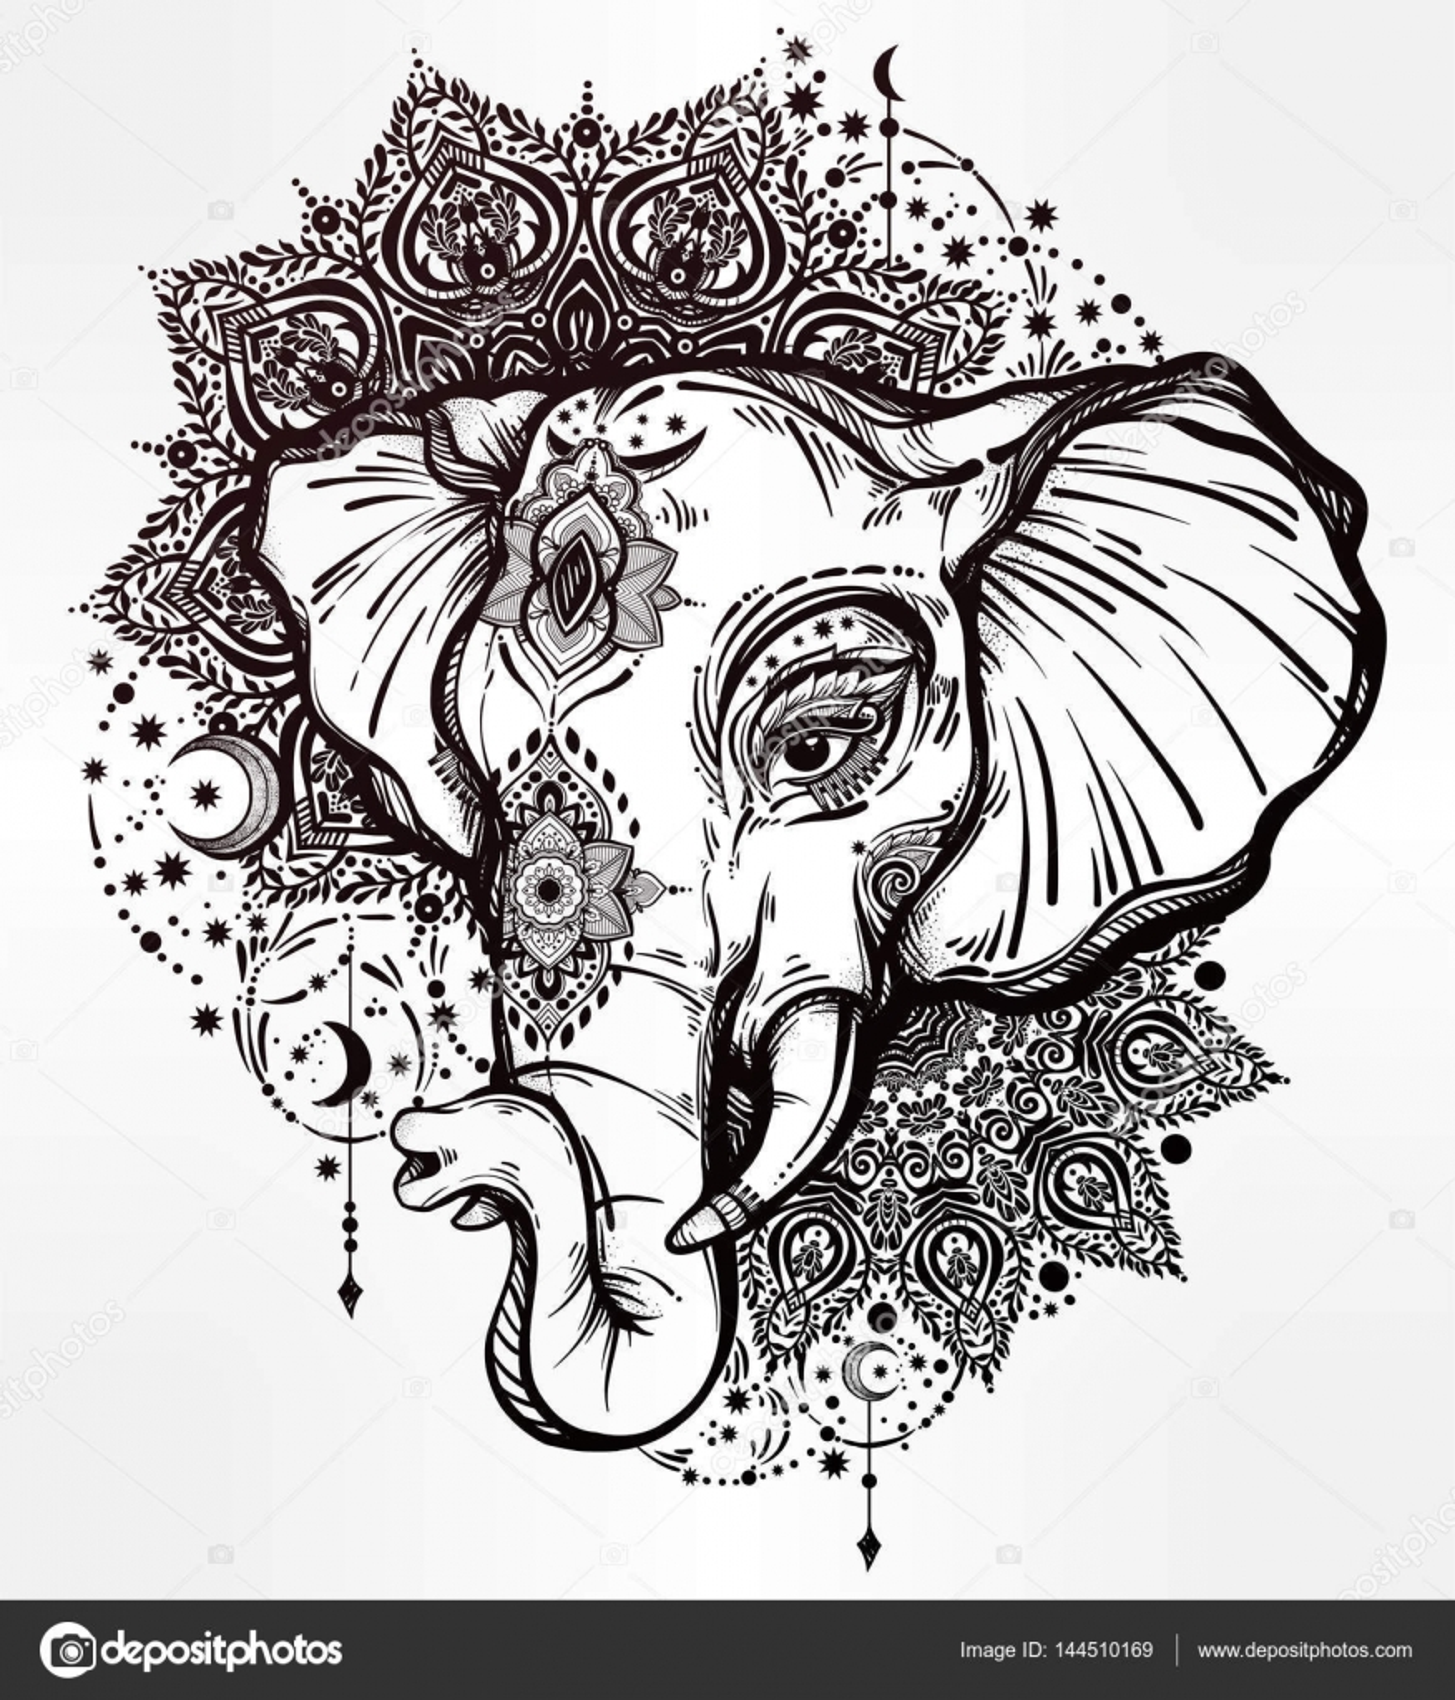 Elephant Mandala Tattoo Tattoos T Tatuajes Elefantes Y: Elefante Decorativo Con Adornos Tribales Mandala